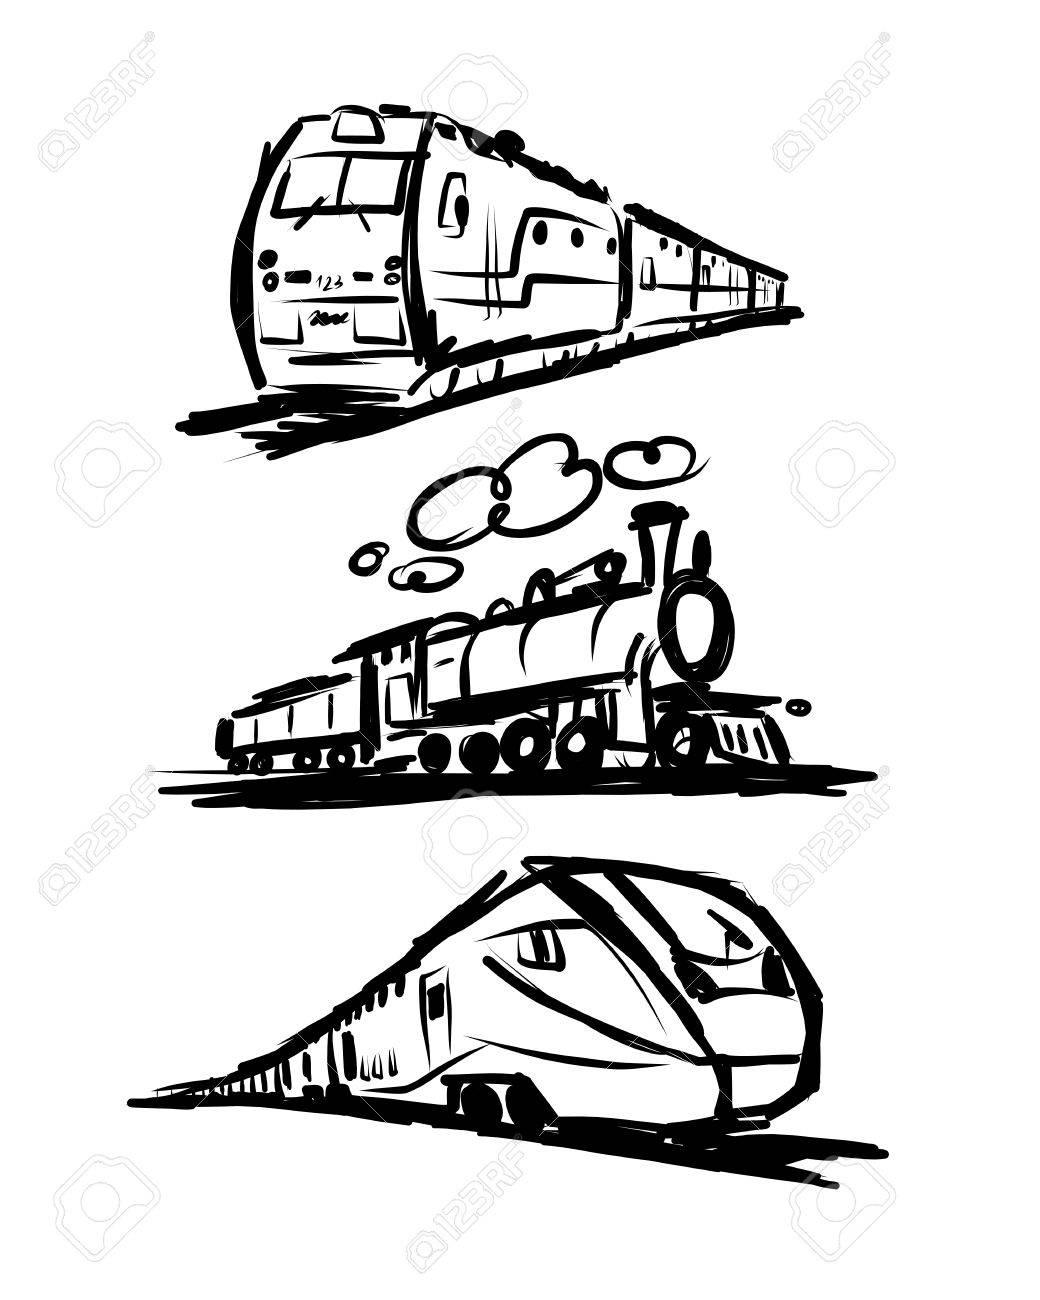 Speed train, sketch for your design. Vector illustration - 56543936